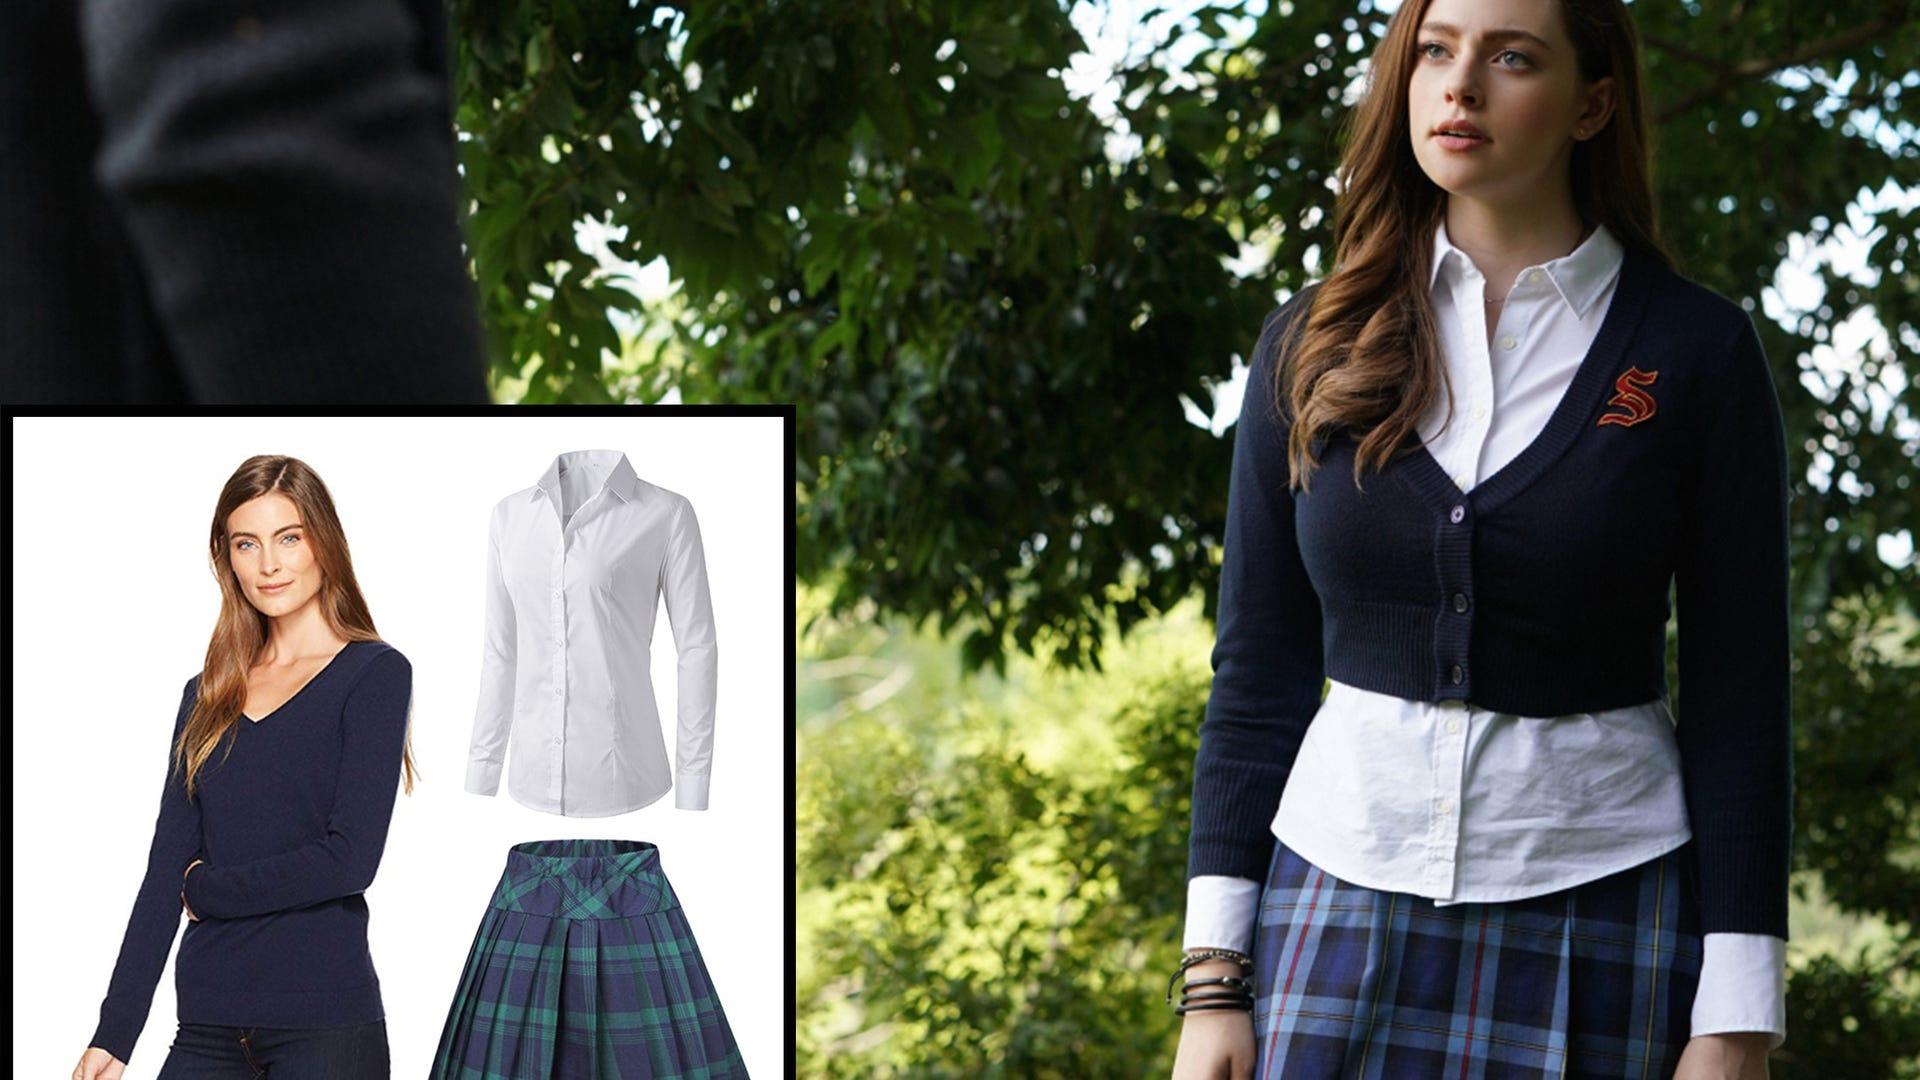 181121-gift-ideas-hope-legacies-sweater-skirt-combo.jpg